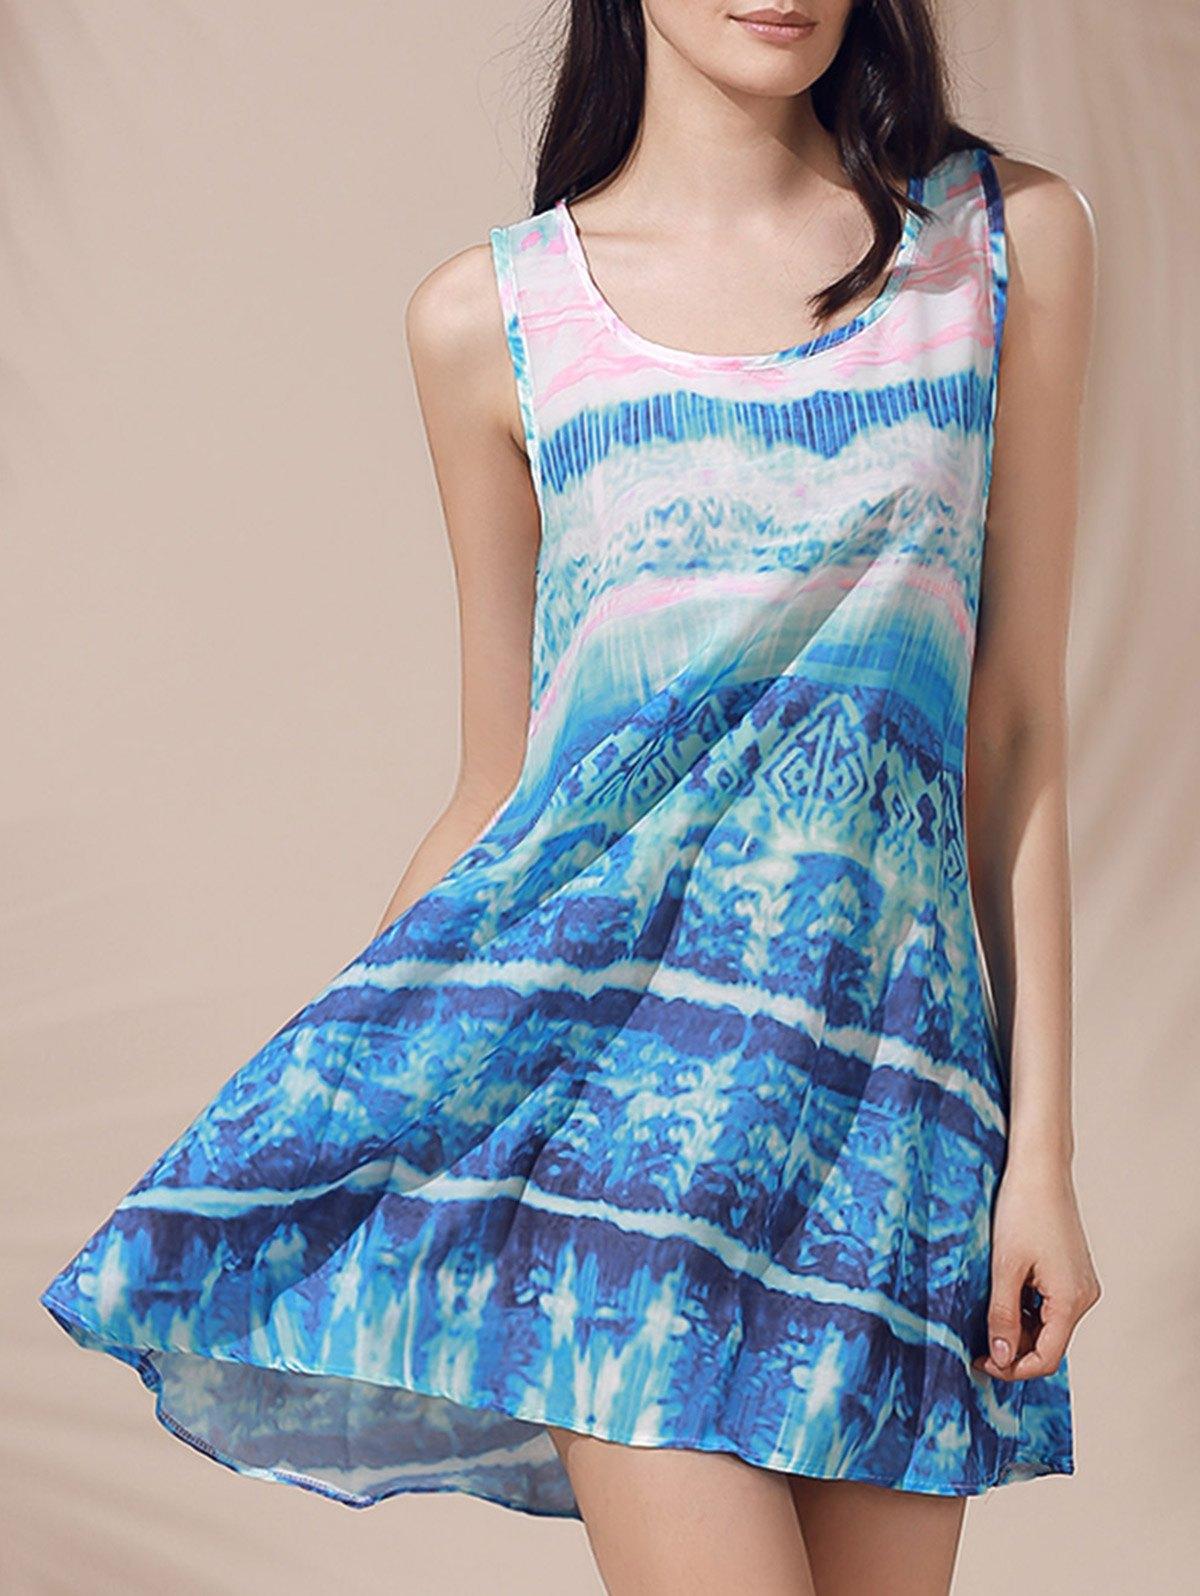 Scoop Neck Printed Sleeveless Sun Dress For Women